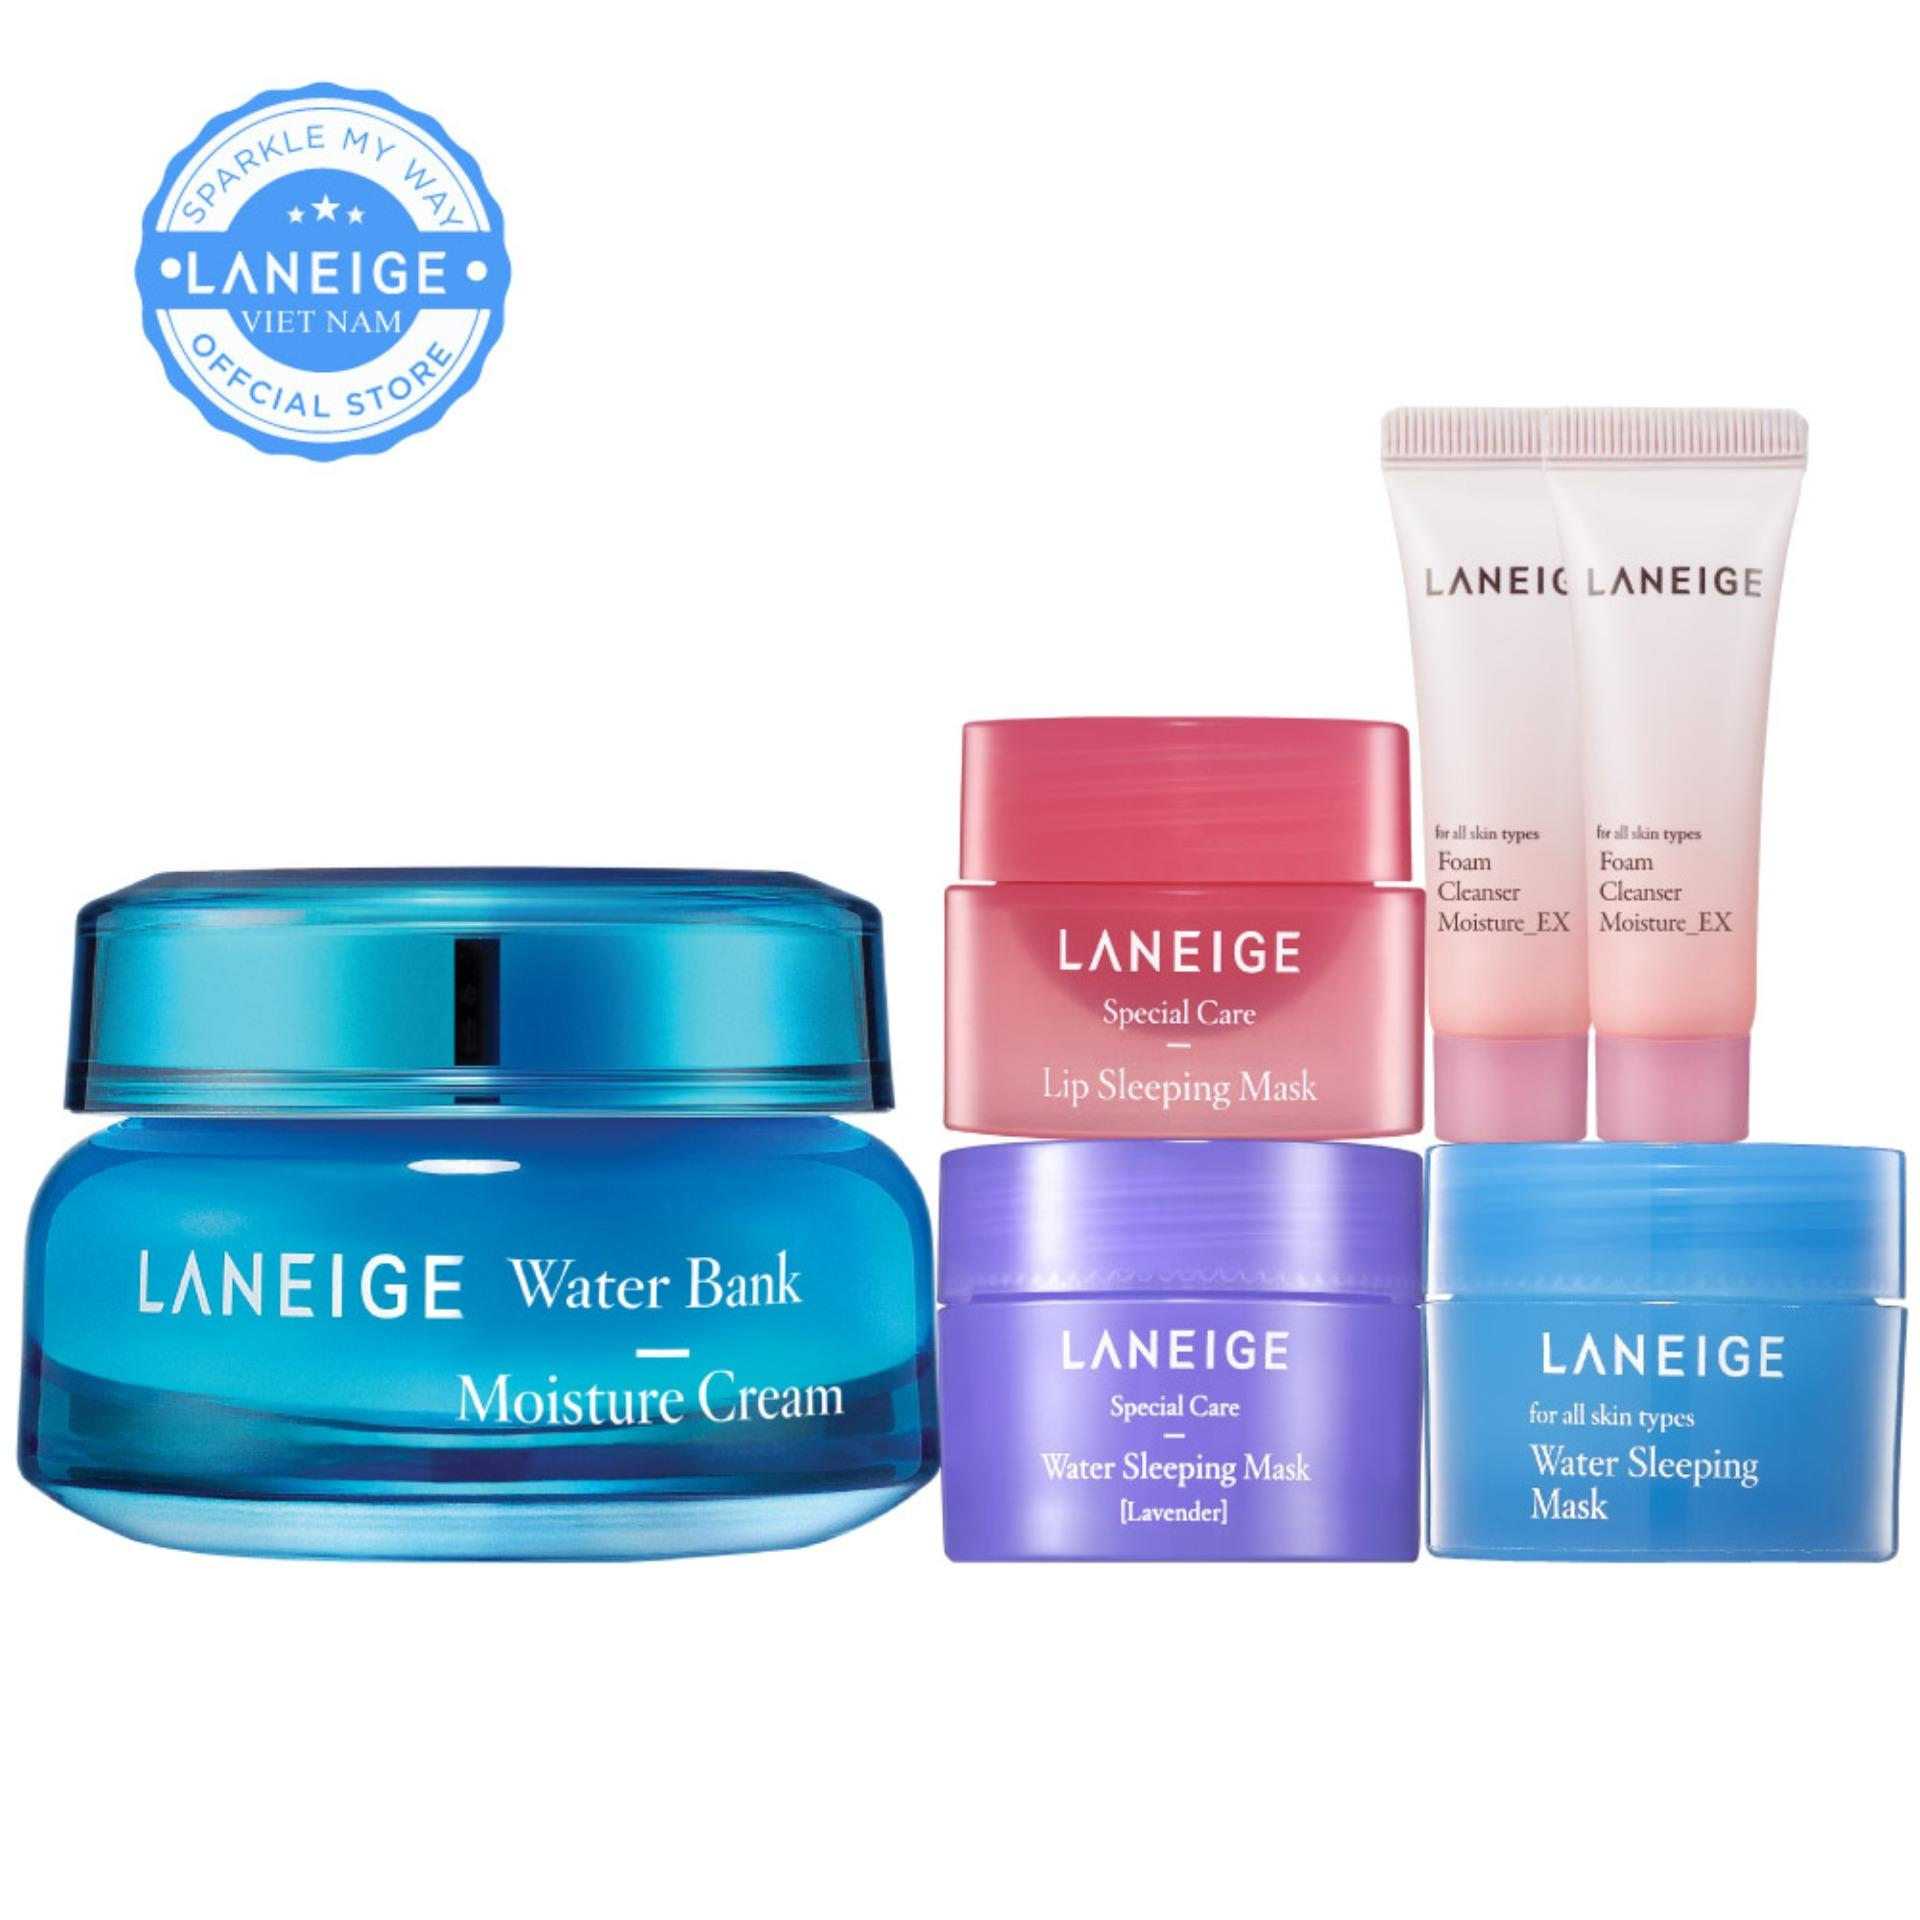 Kem dưỡng ẩm Laneige Water Bank Moisture Cream 50ml + Tặng Bộ Quà Sleeping Care Good Night Kit